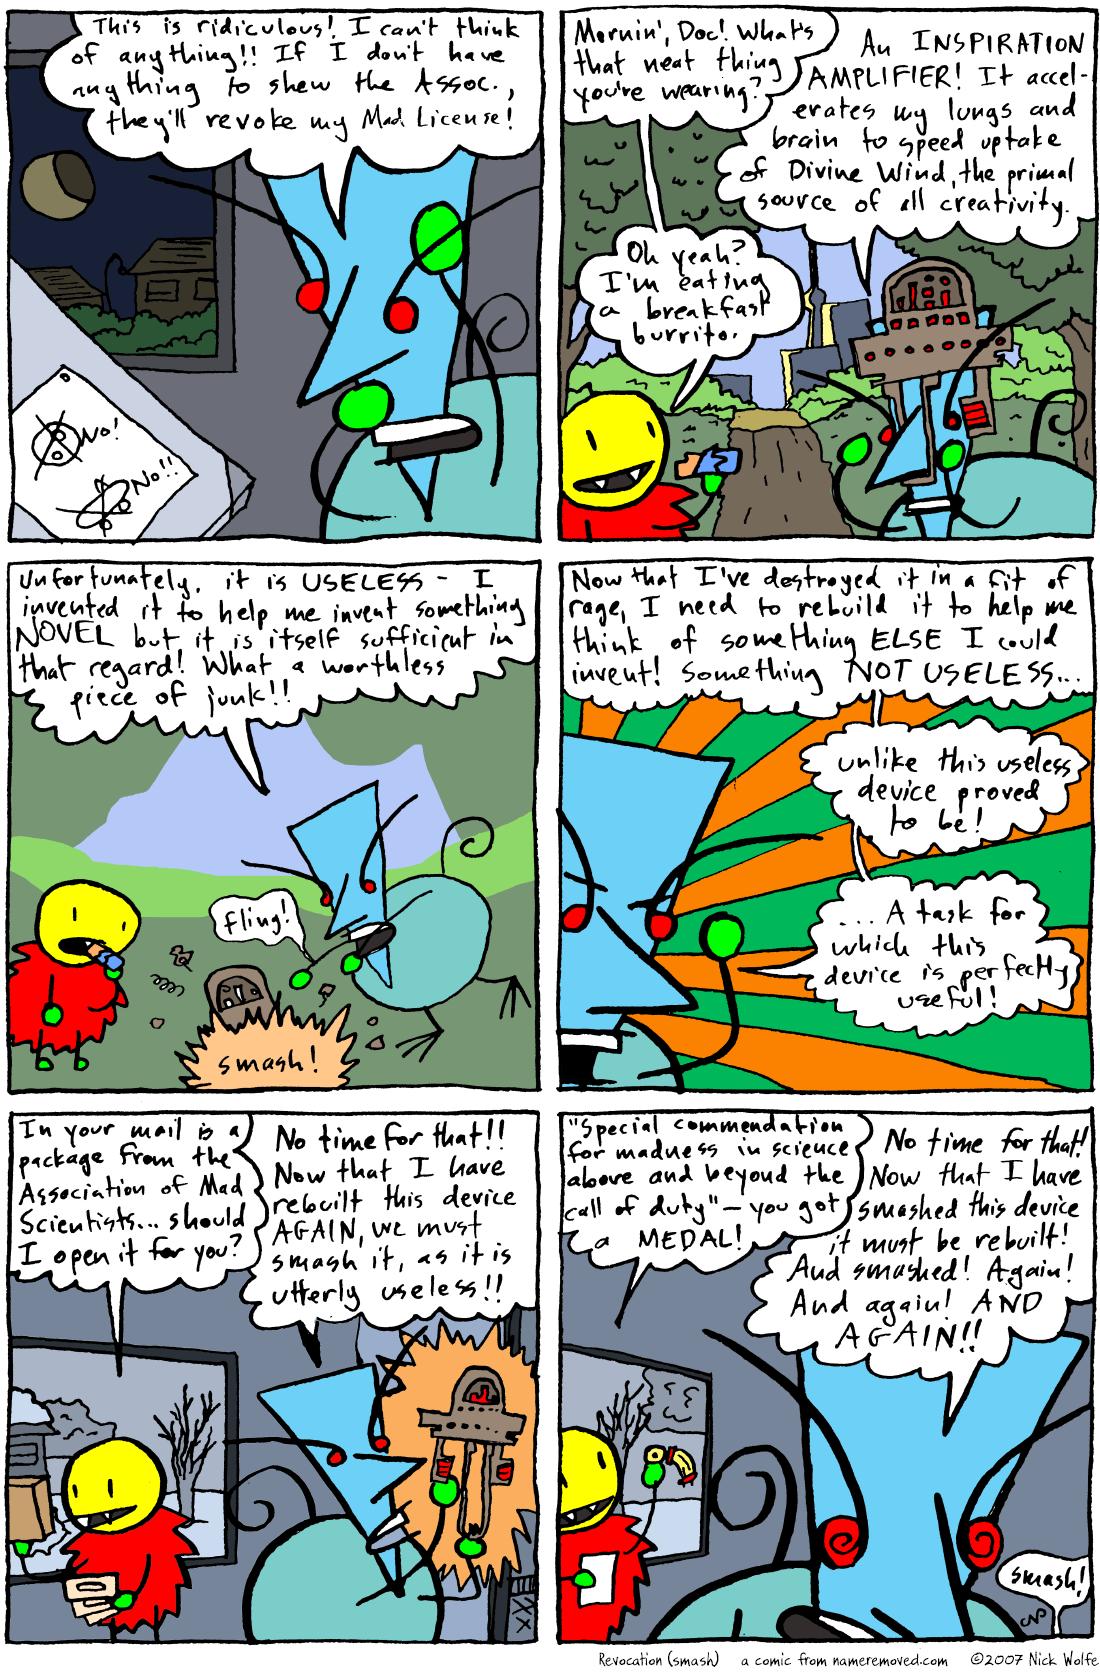 Revocation (smash)